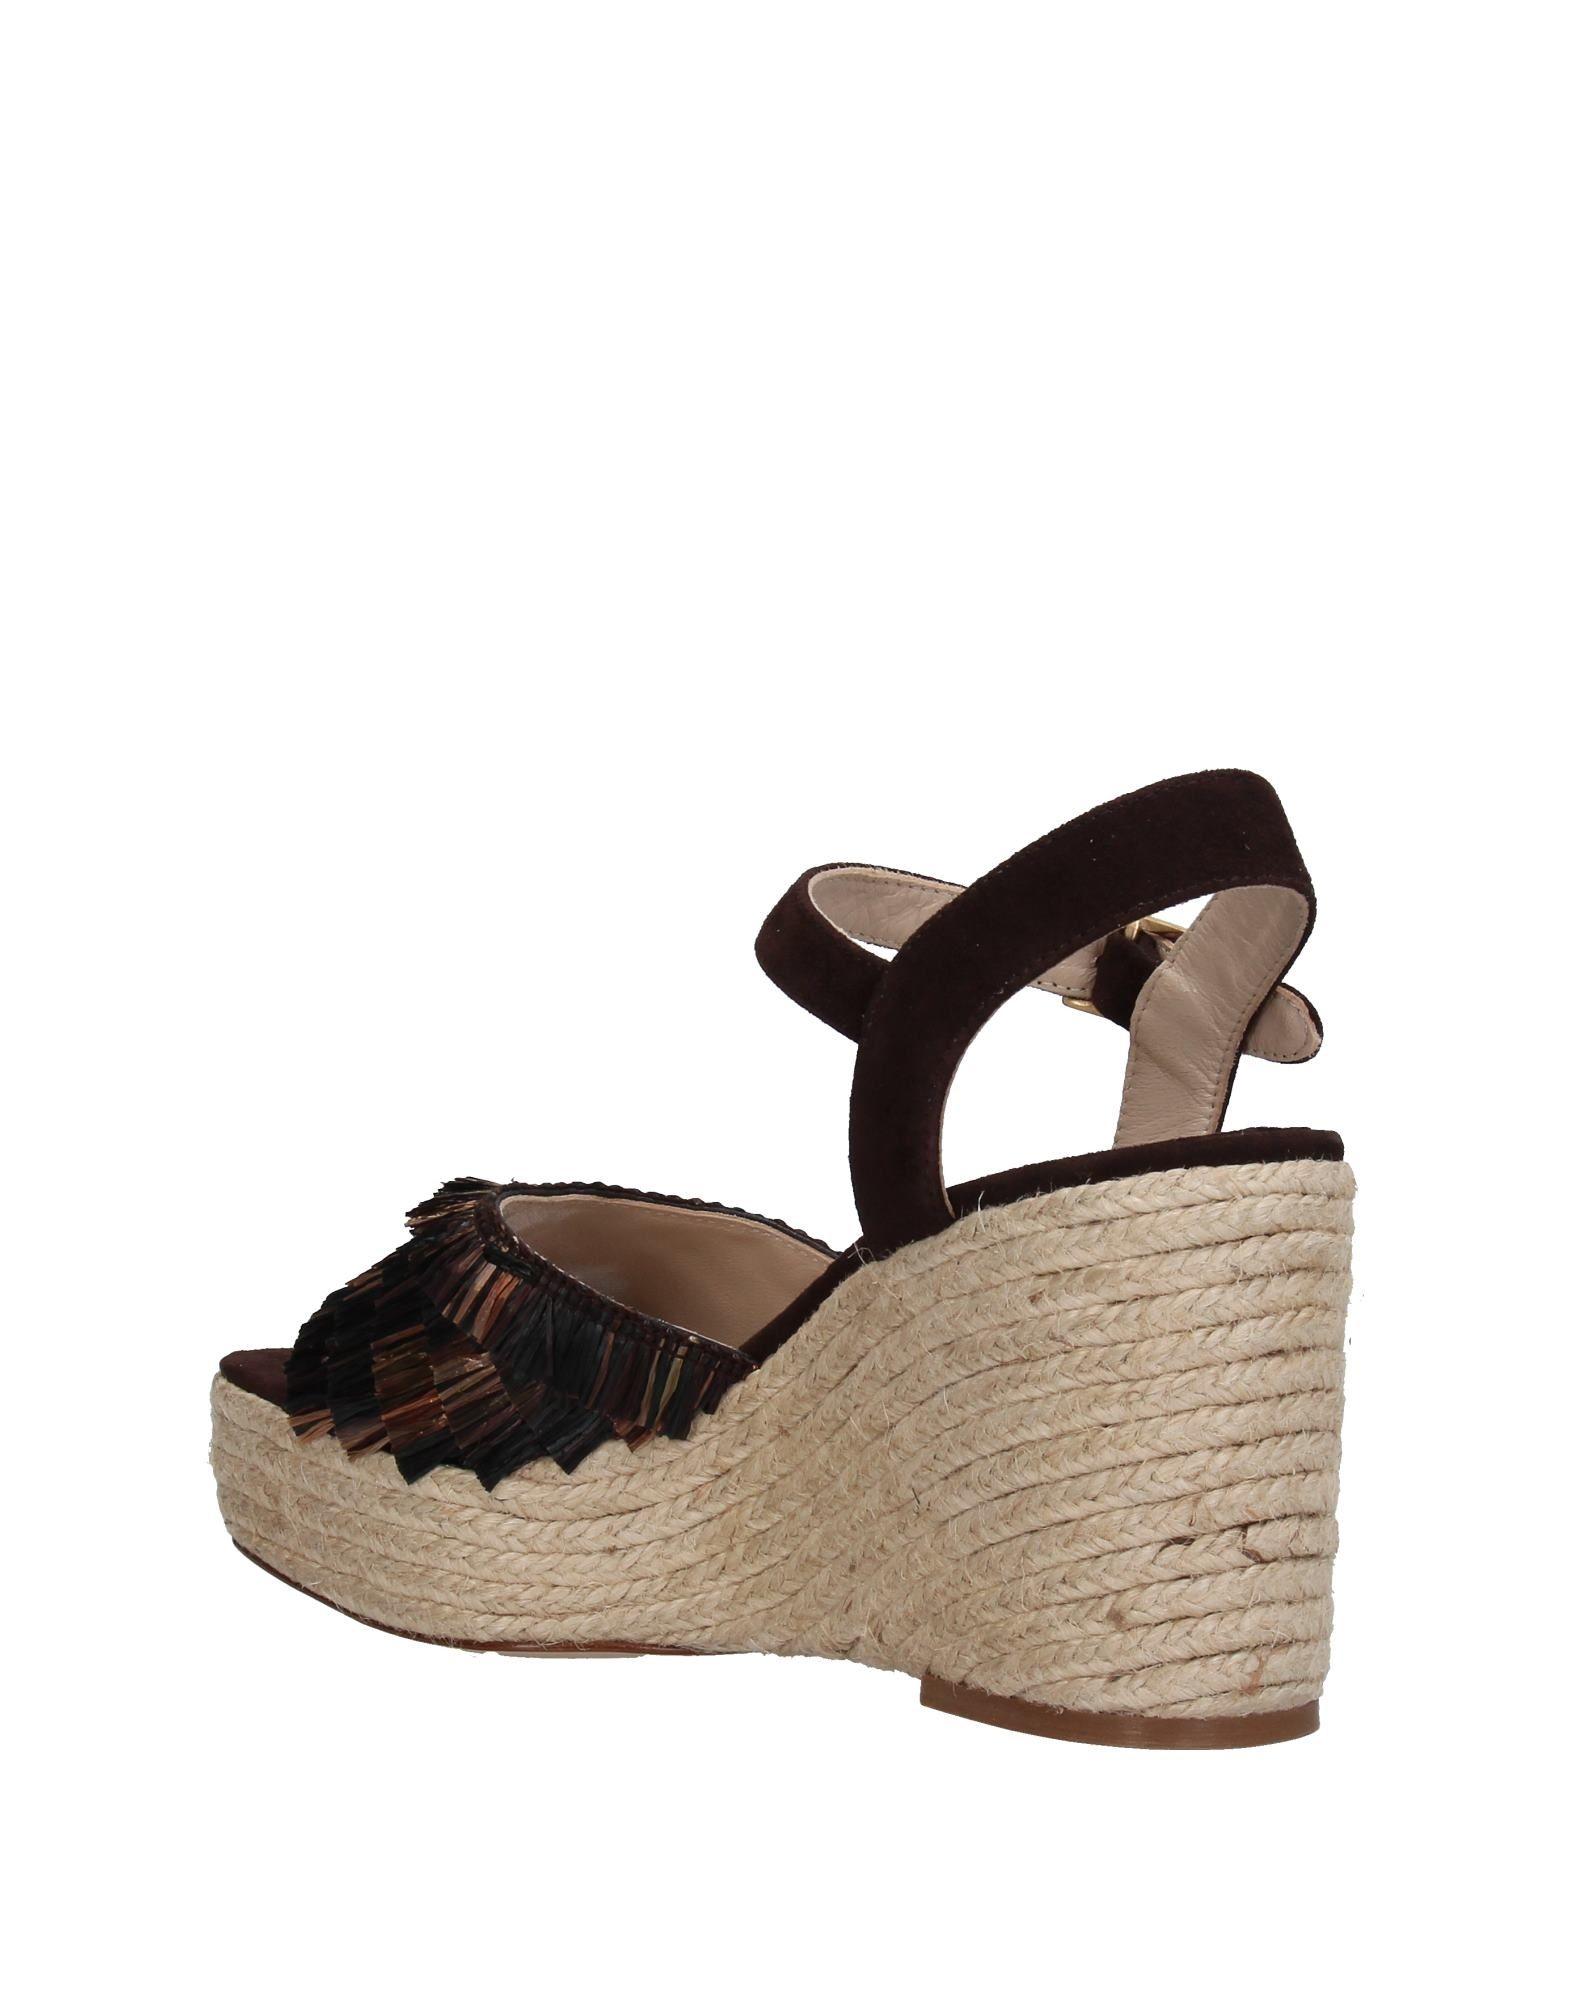 Paloma Barceló Sandalen Damen  11390145QH Gute Qualität beliebte Schuhe